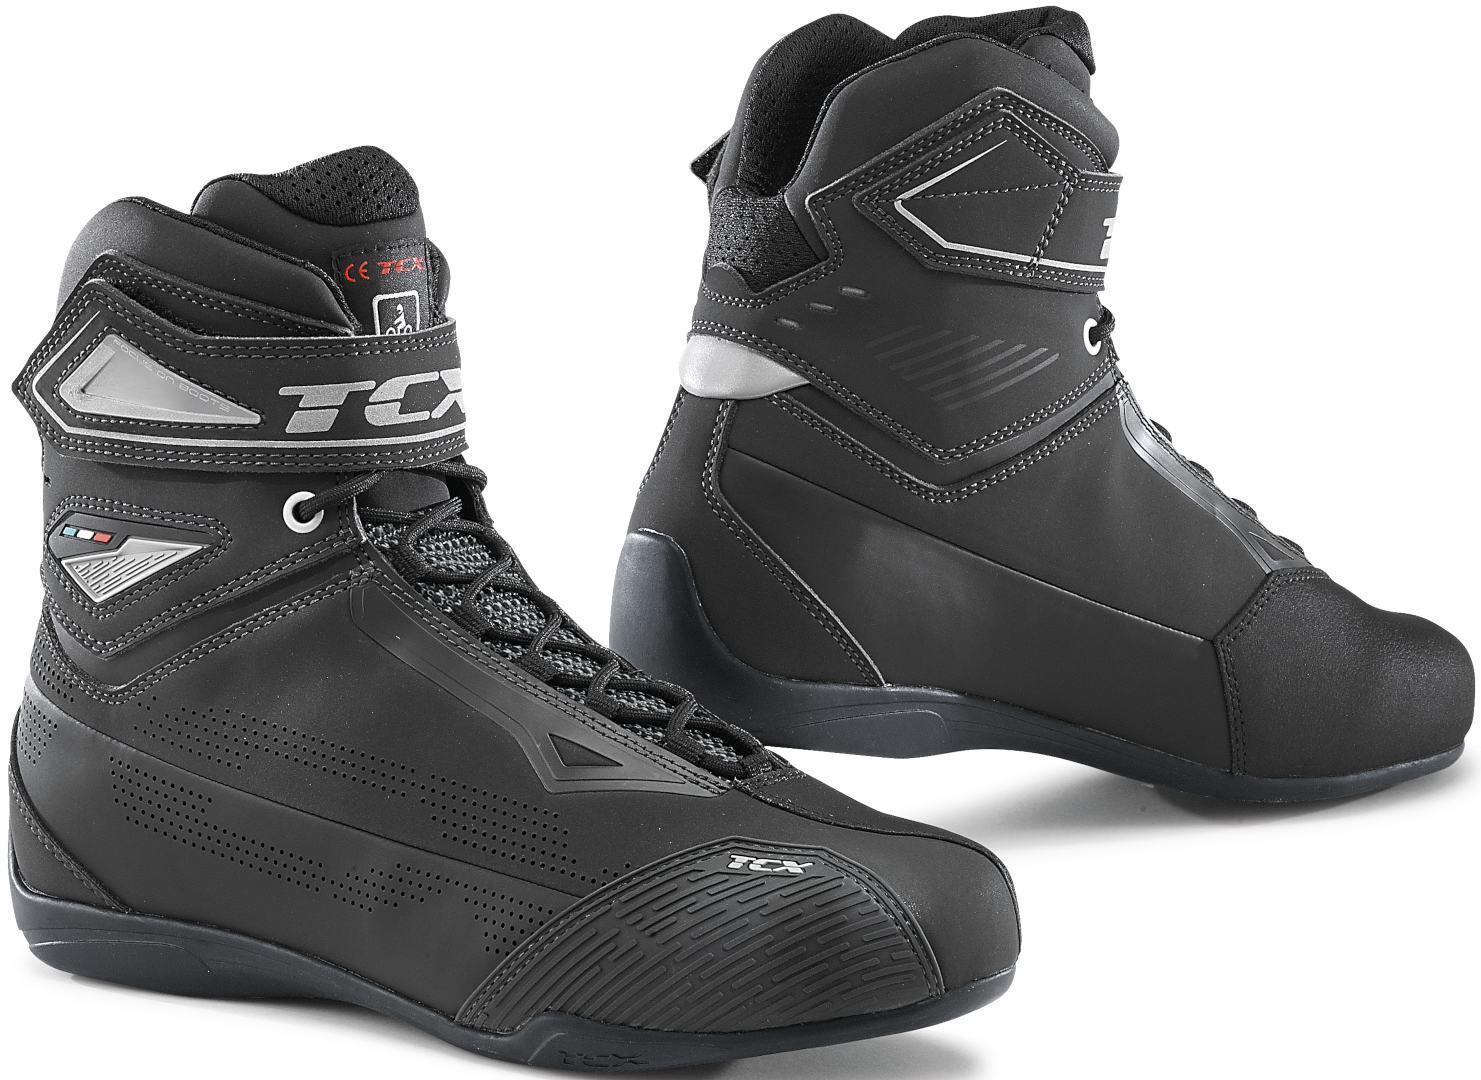 TCX Rush 2 Air perforierte Motorradschuhe, grau, Größe 43, grau, Größe 43